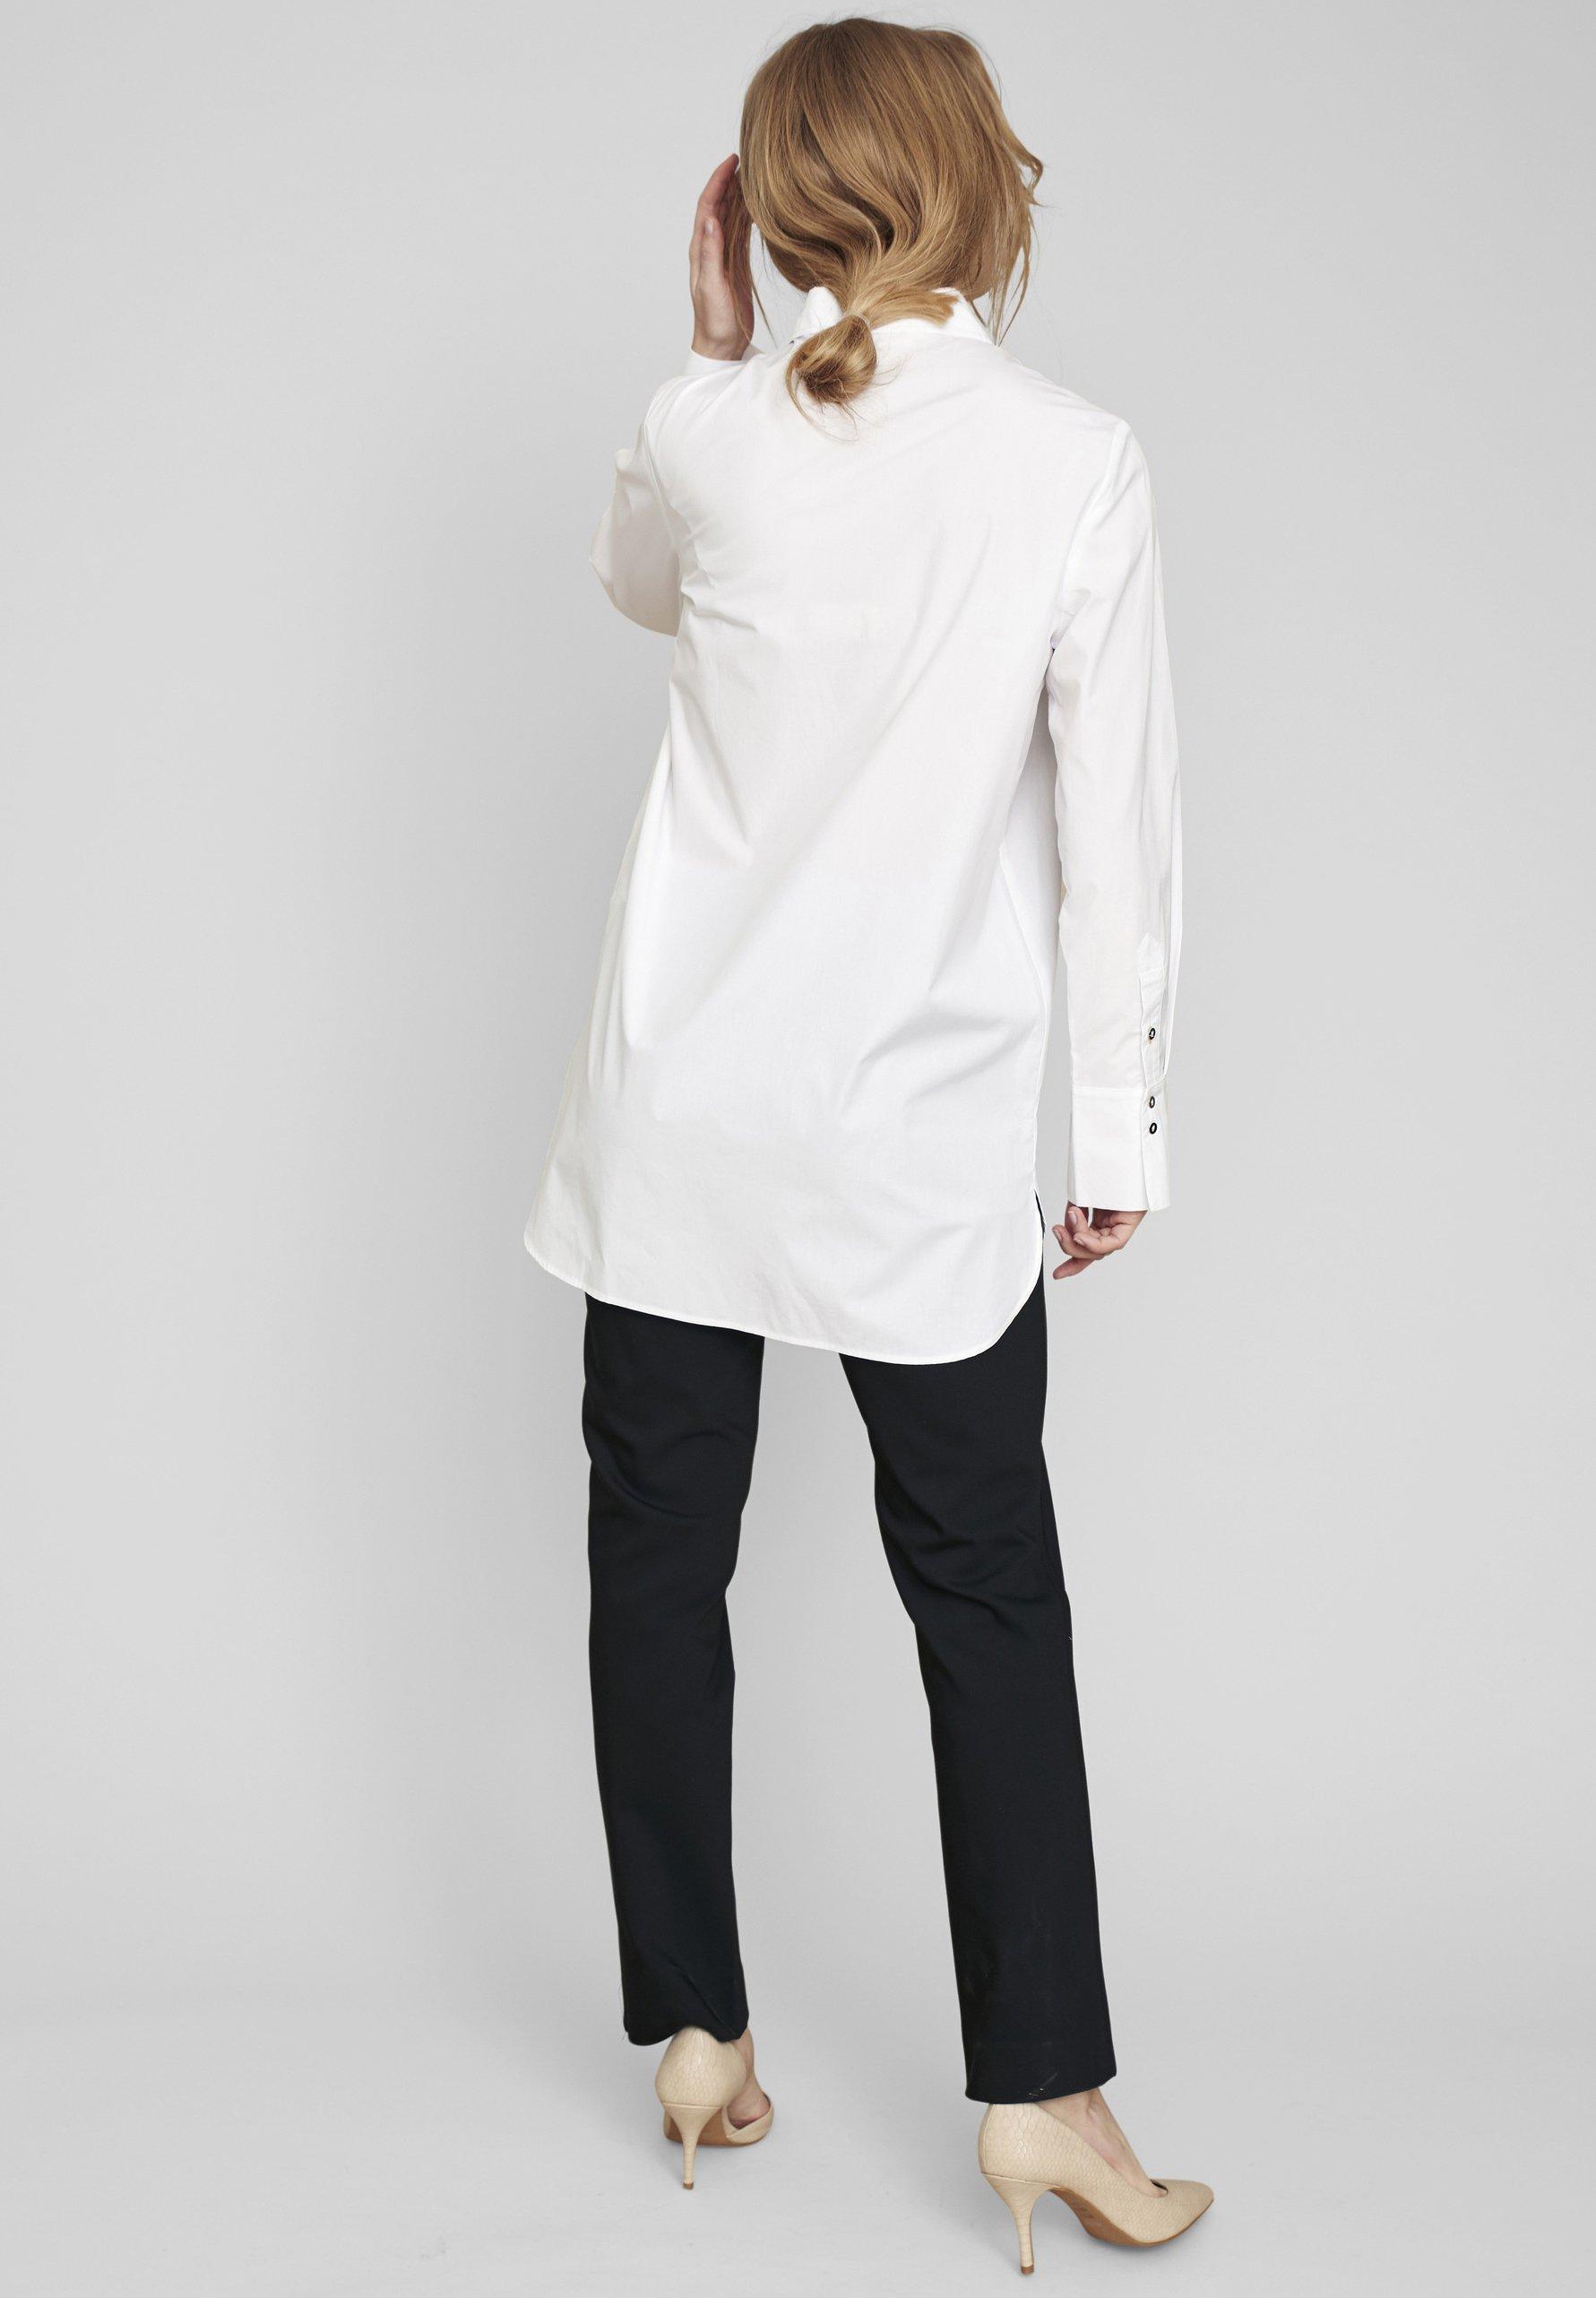 ECHTE Overhemdblouse - white - Dameskleding Oprecht